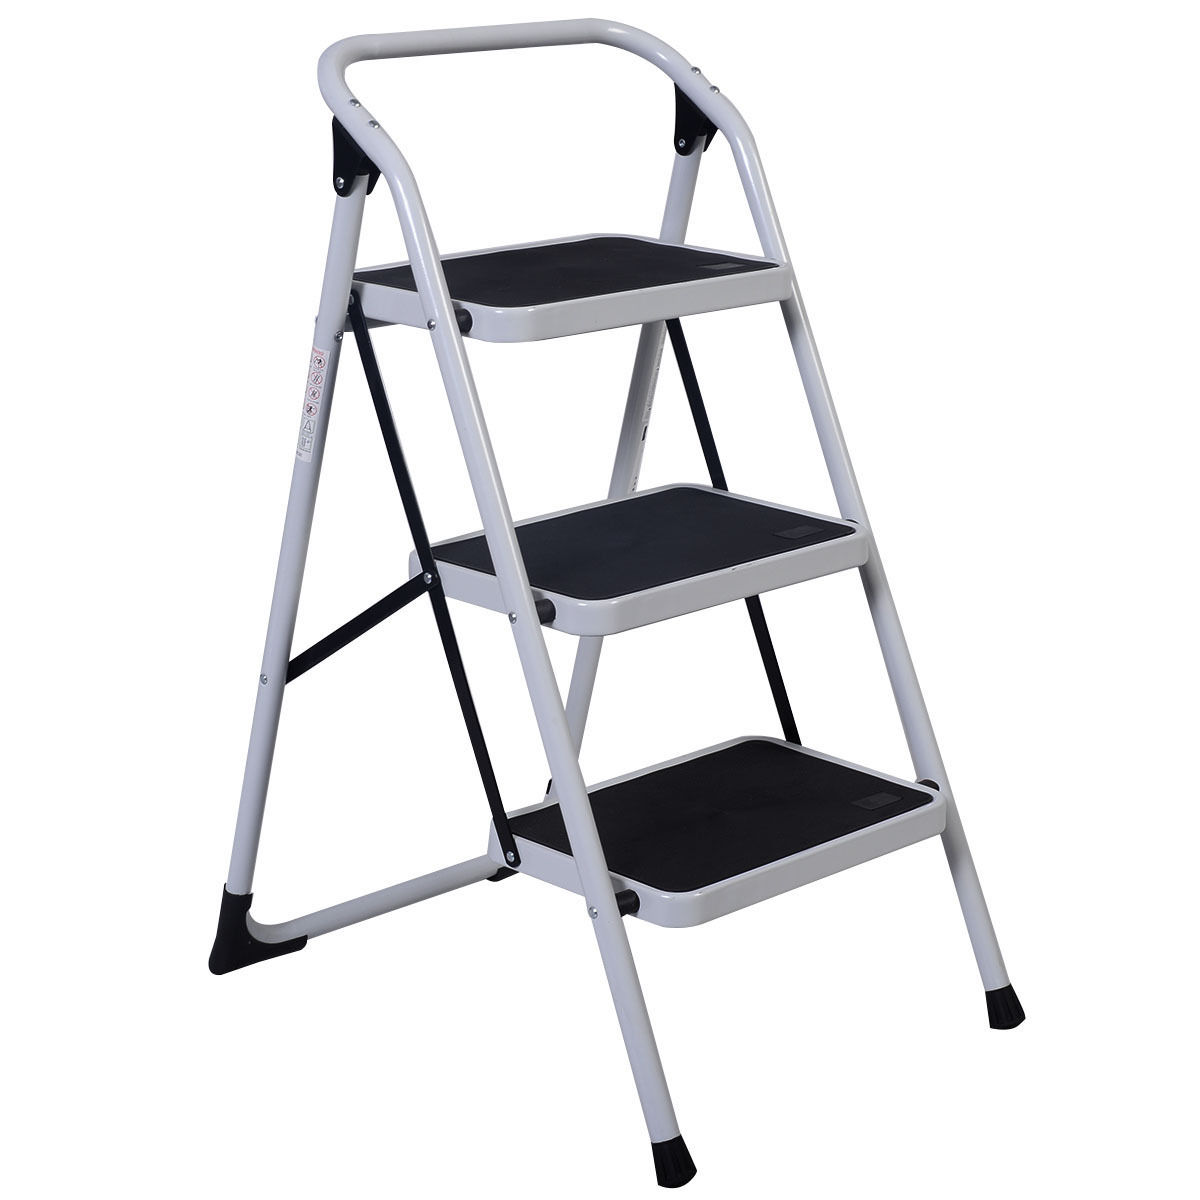 Costway 3 Step Lightweight Ladder HD Platform Foldable Stool 330 LB Cap. Saving Space by Costway